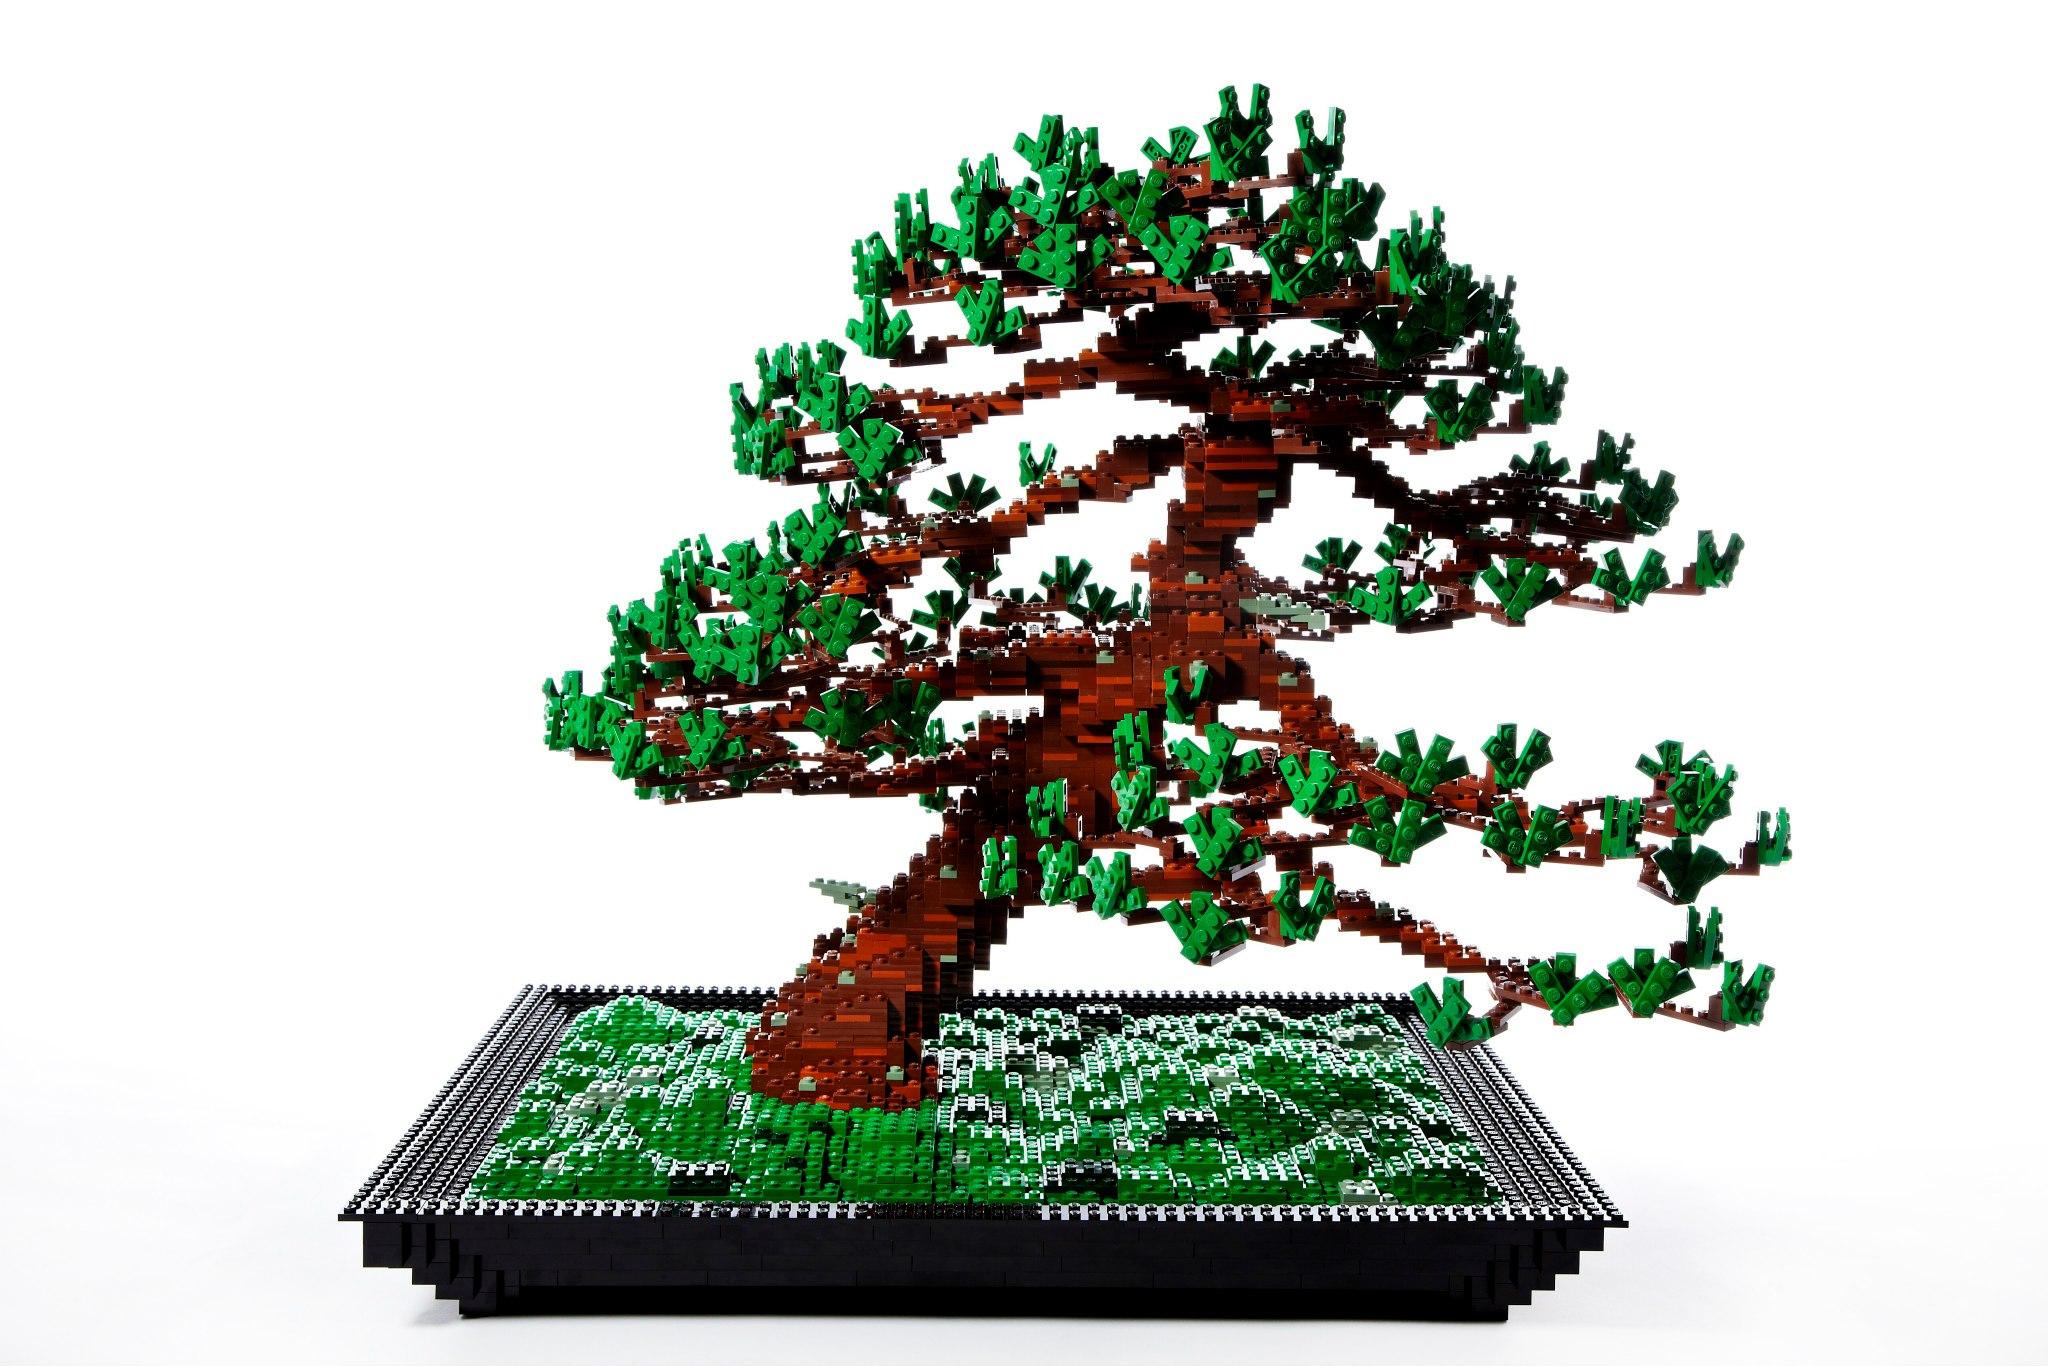 Lego Bonsai Looks Pixelated